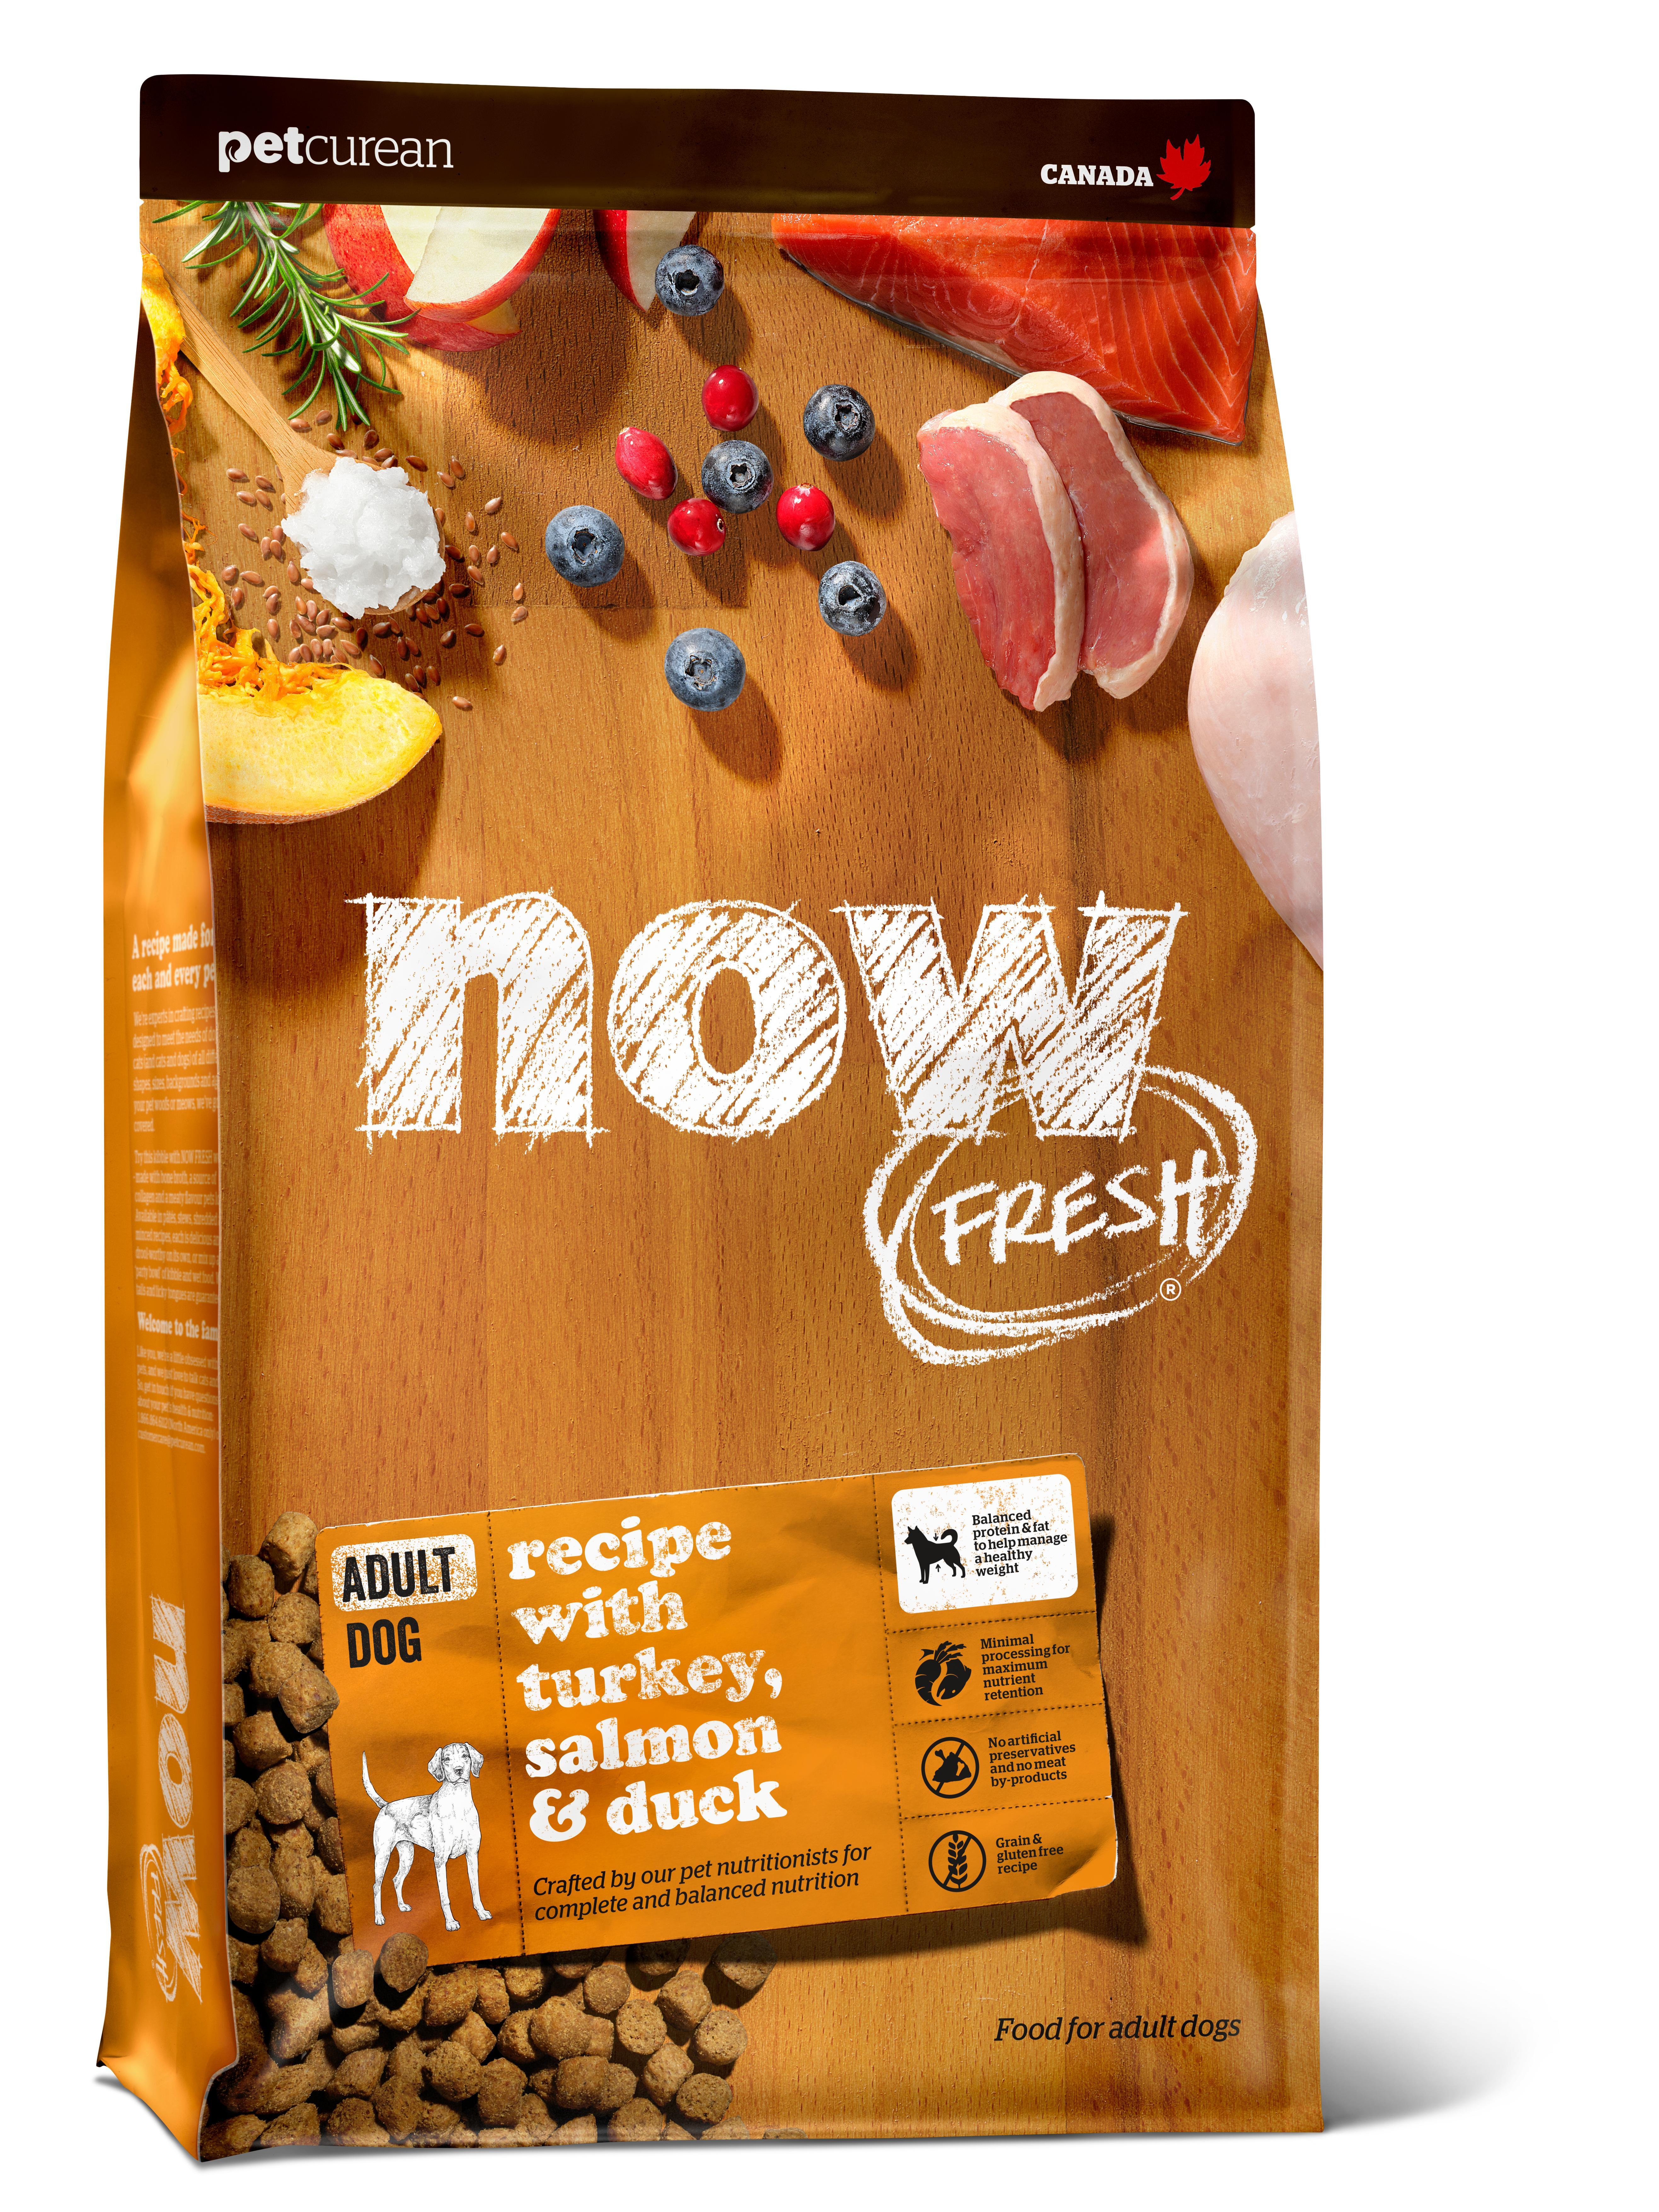 NOW FRESH Turkey, Salmon & Duck Grain-Free Dry Dog Food, 22-lb